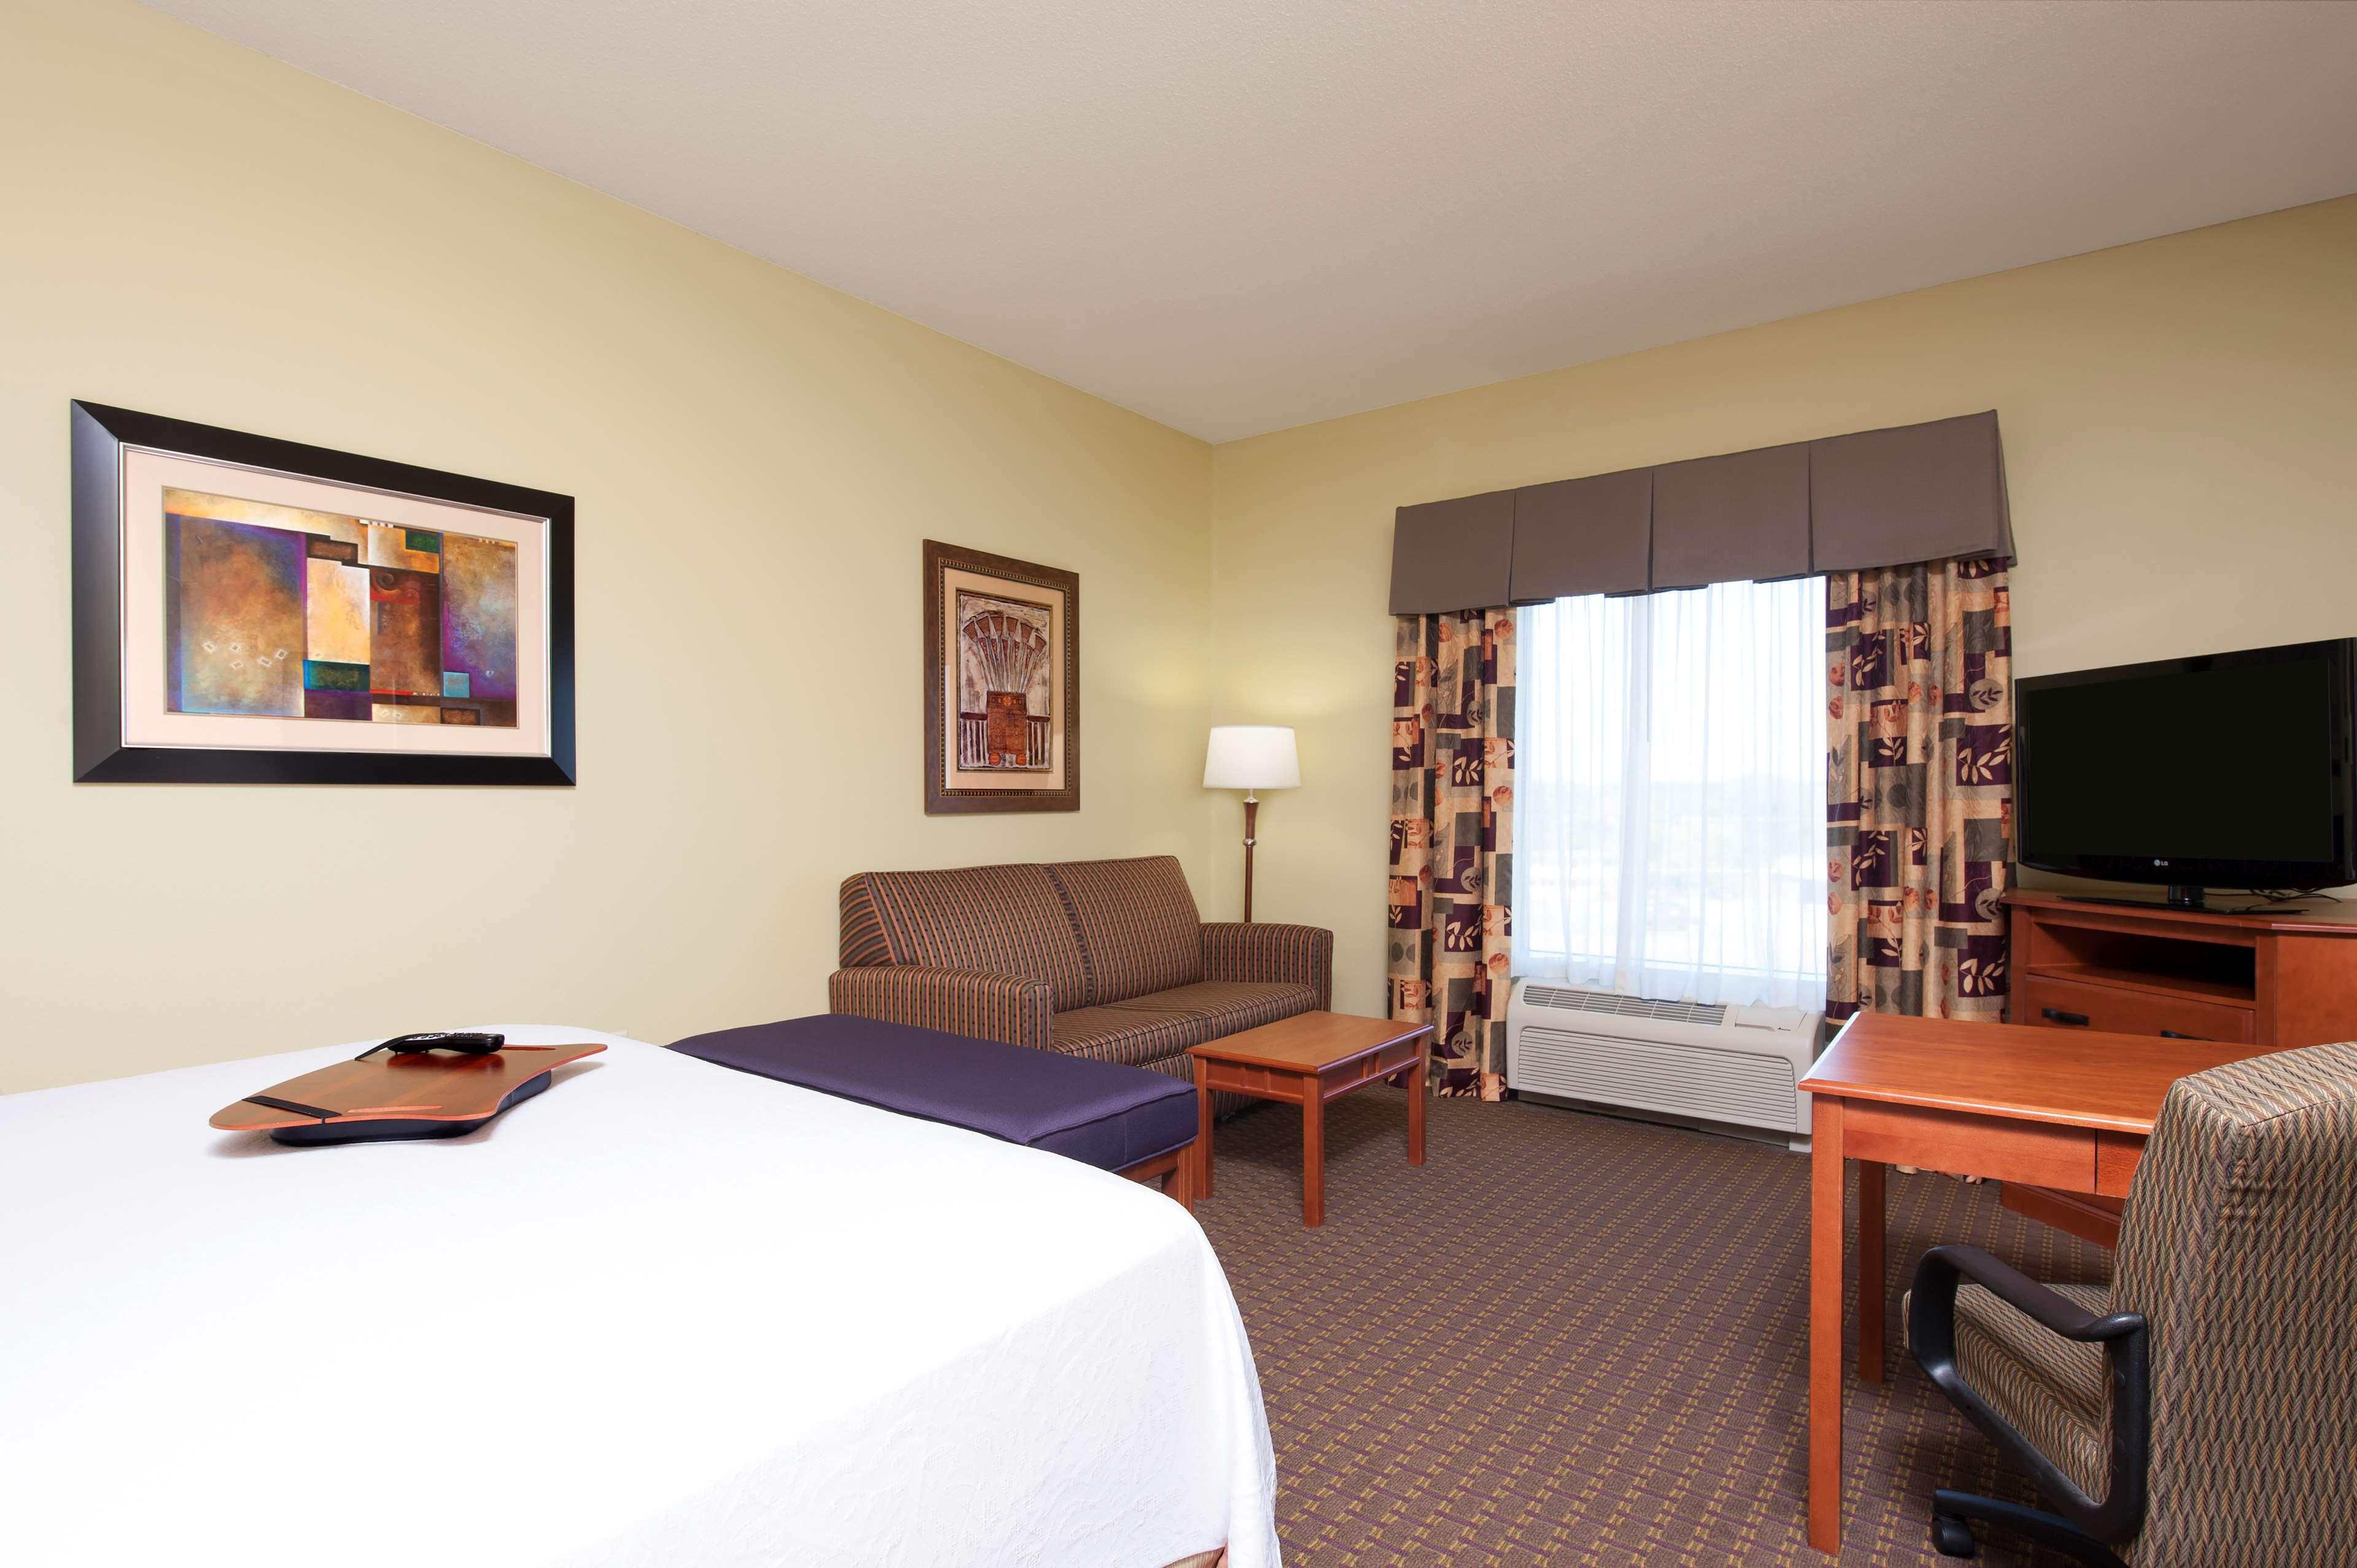 Hampton Inn & Suites Grand Rapids-Airport 28th St image 9